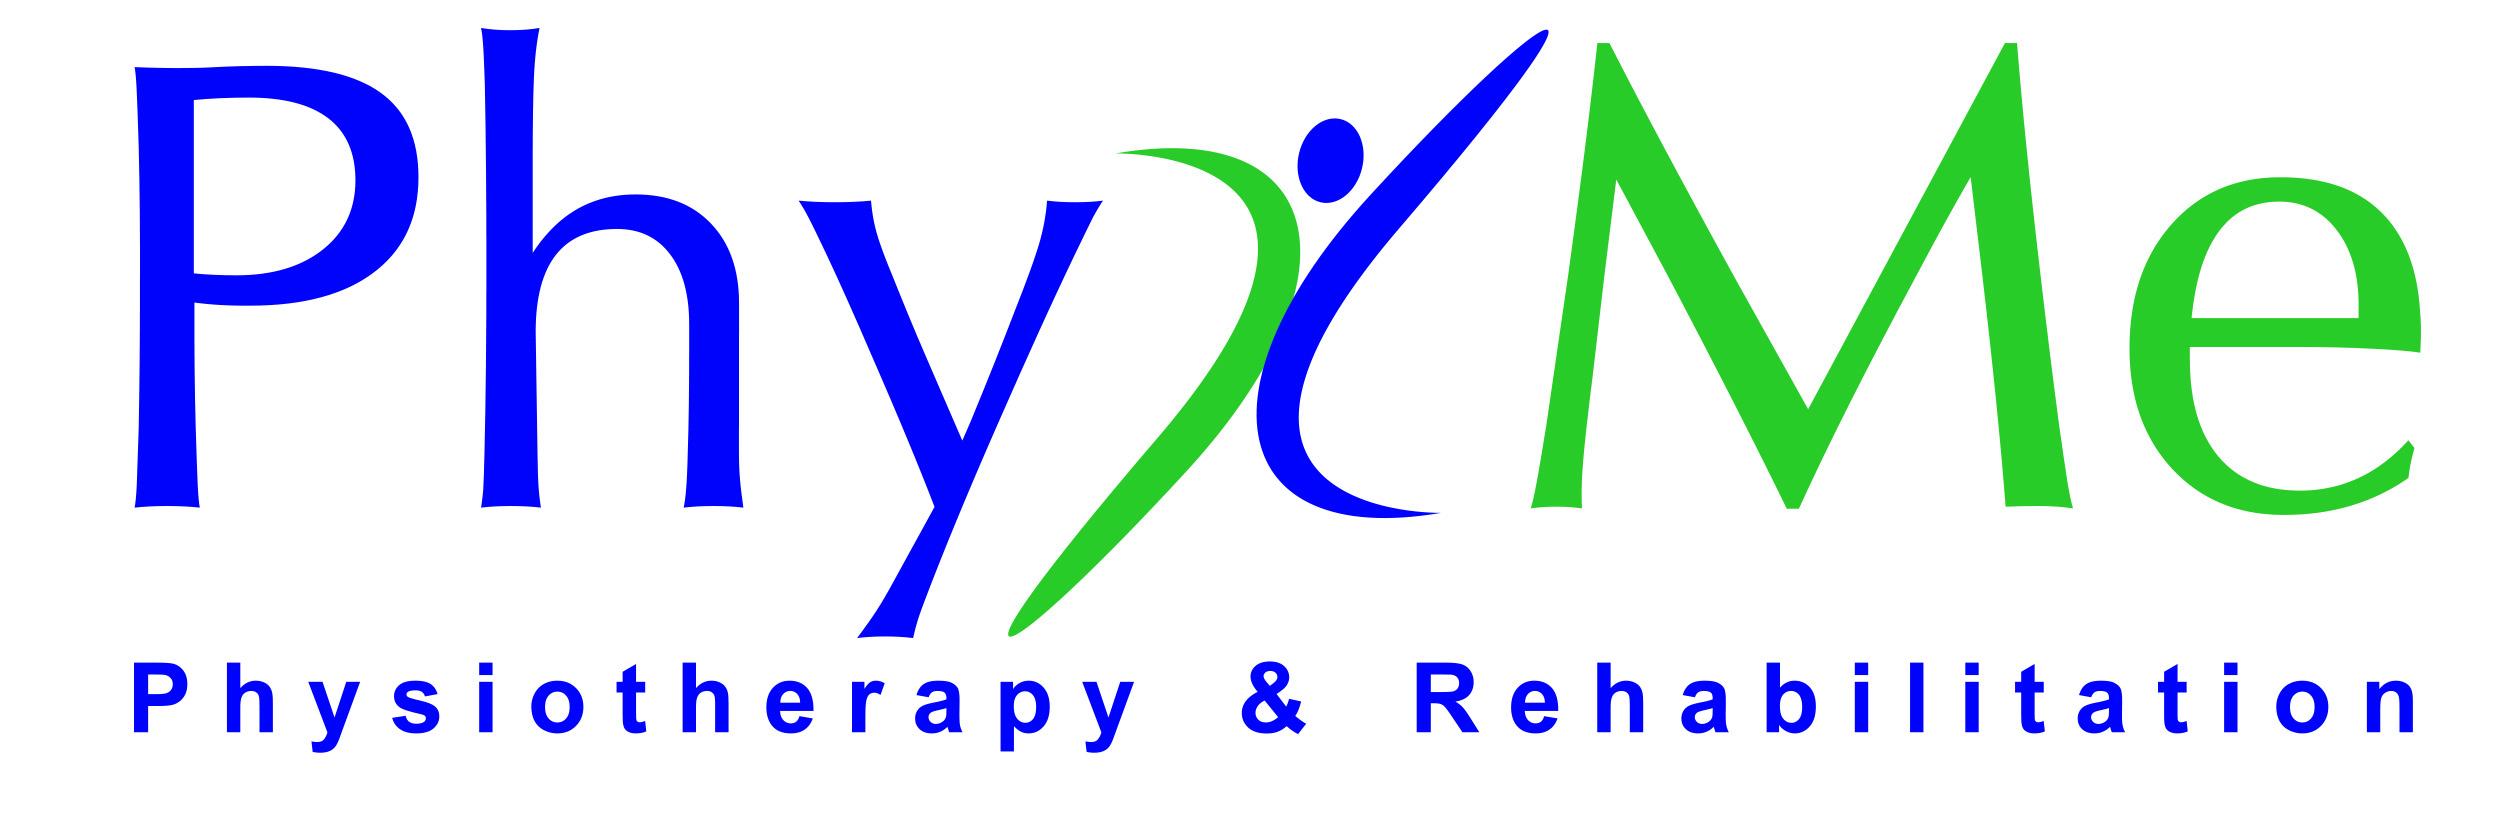 Phyxme Logo & Subtitle.jpg